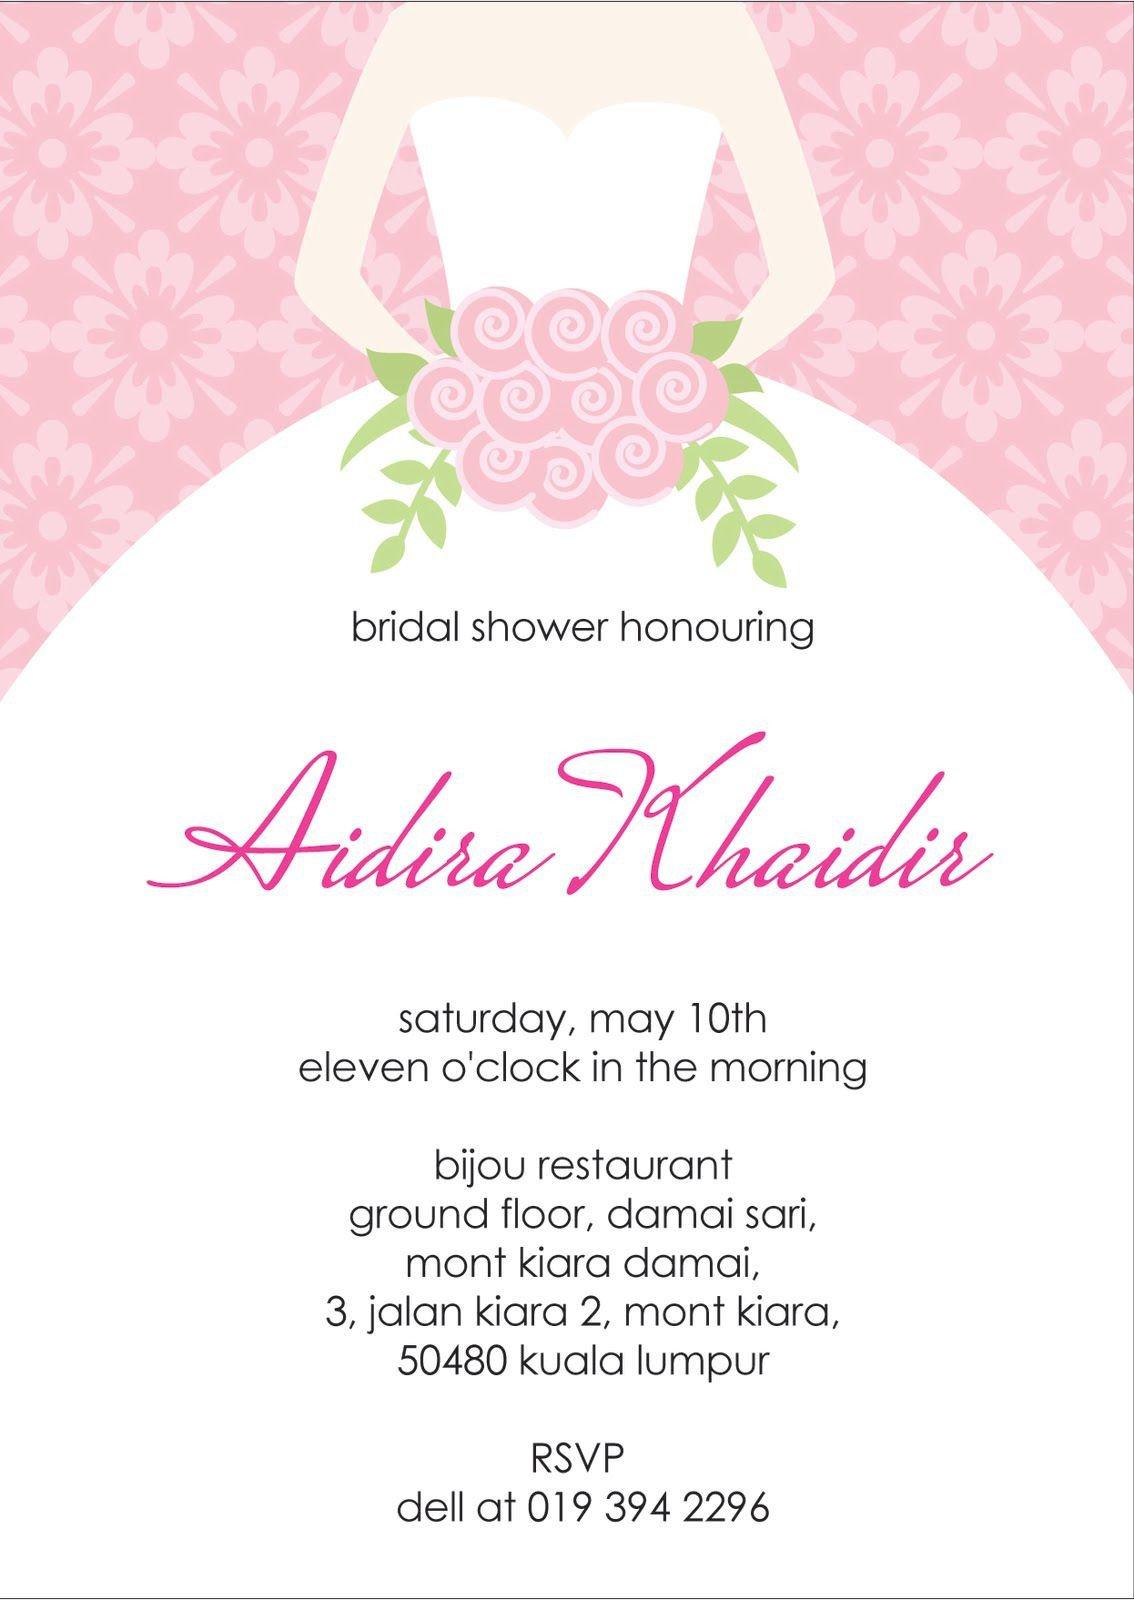 Wedding Shower Invitation Templates Bridal Shower Invitation Verbiage Bridal Shower